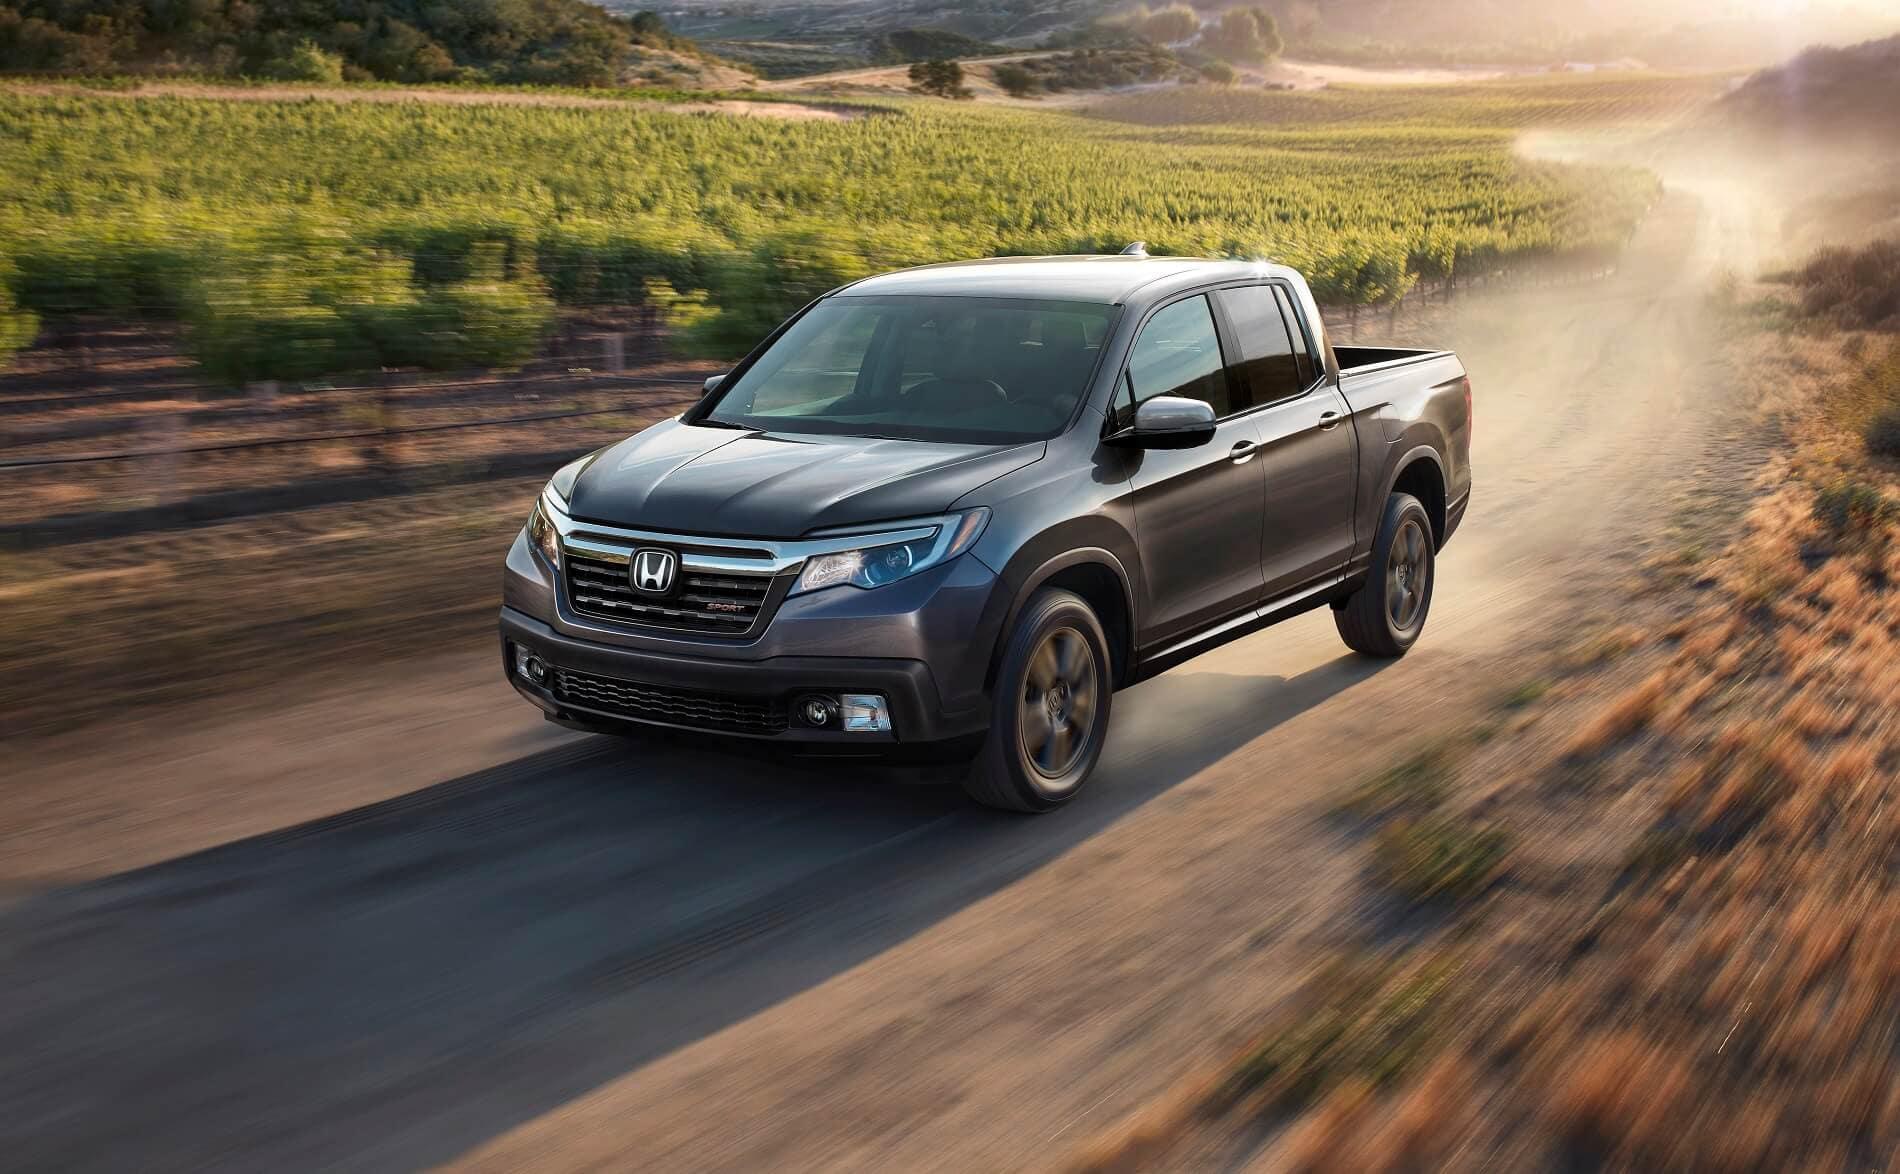 2020 Honda Ridgeline Driving